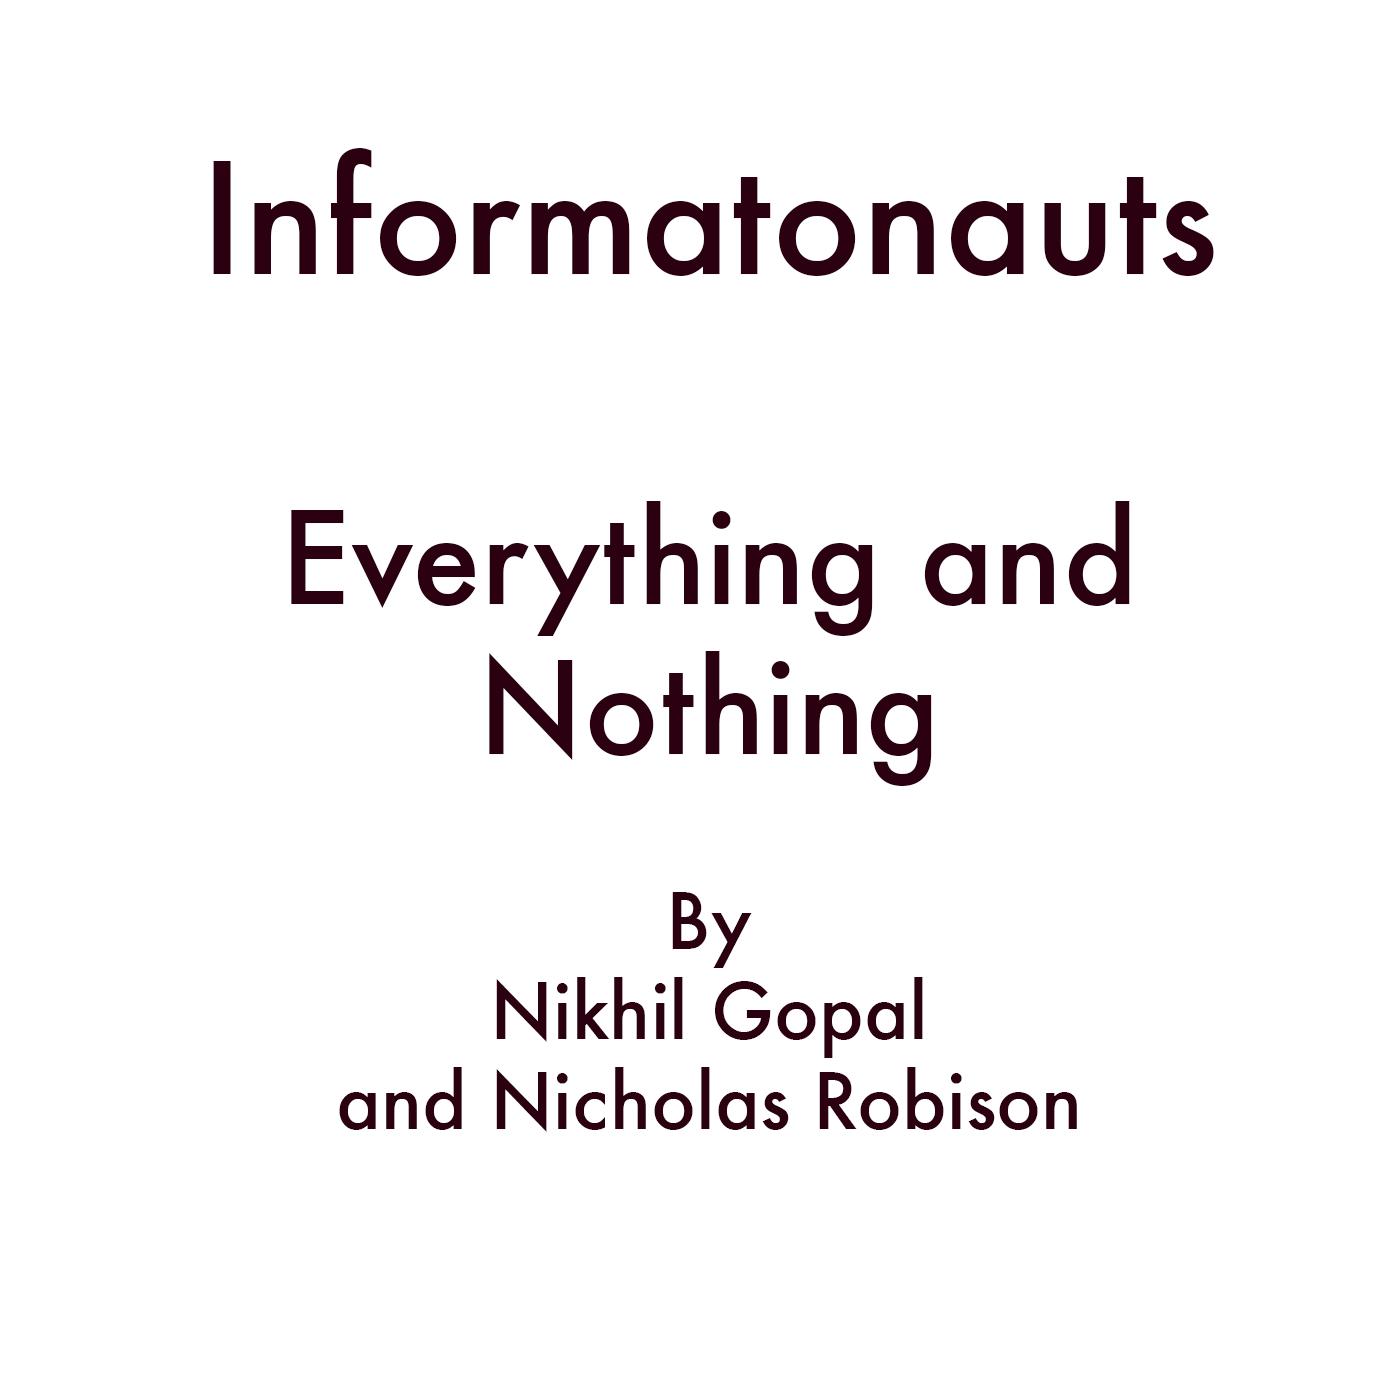 Informatonauts Logo